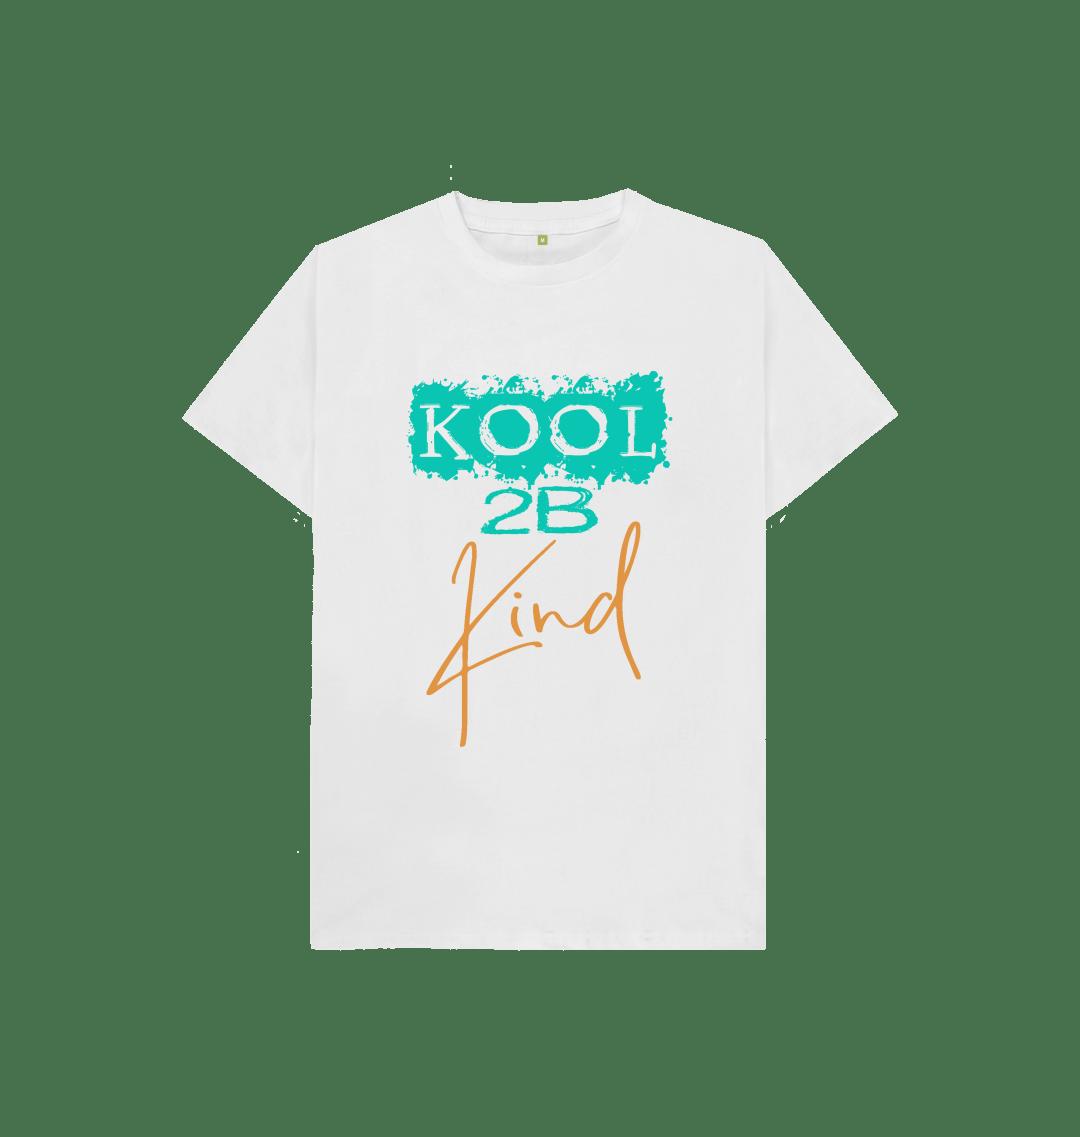 Kool 2B Kind Kids Sustainable Organic Cotton T Shirt (Various colours) Kind Shop 3